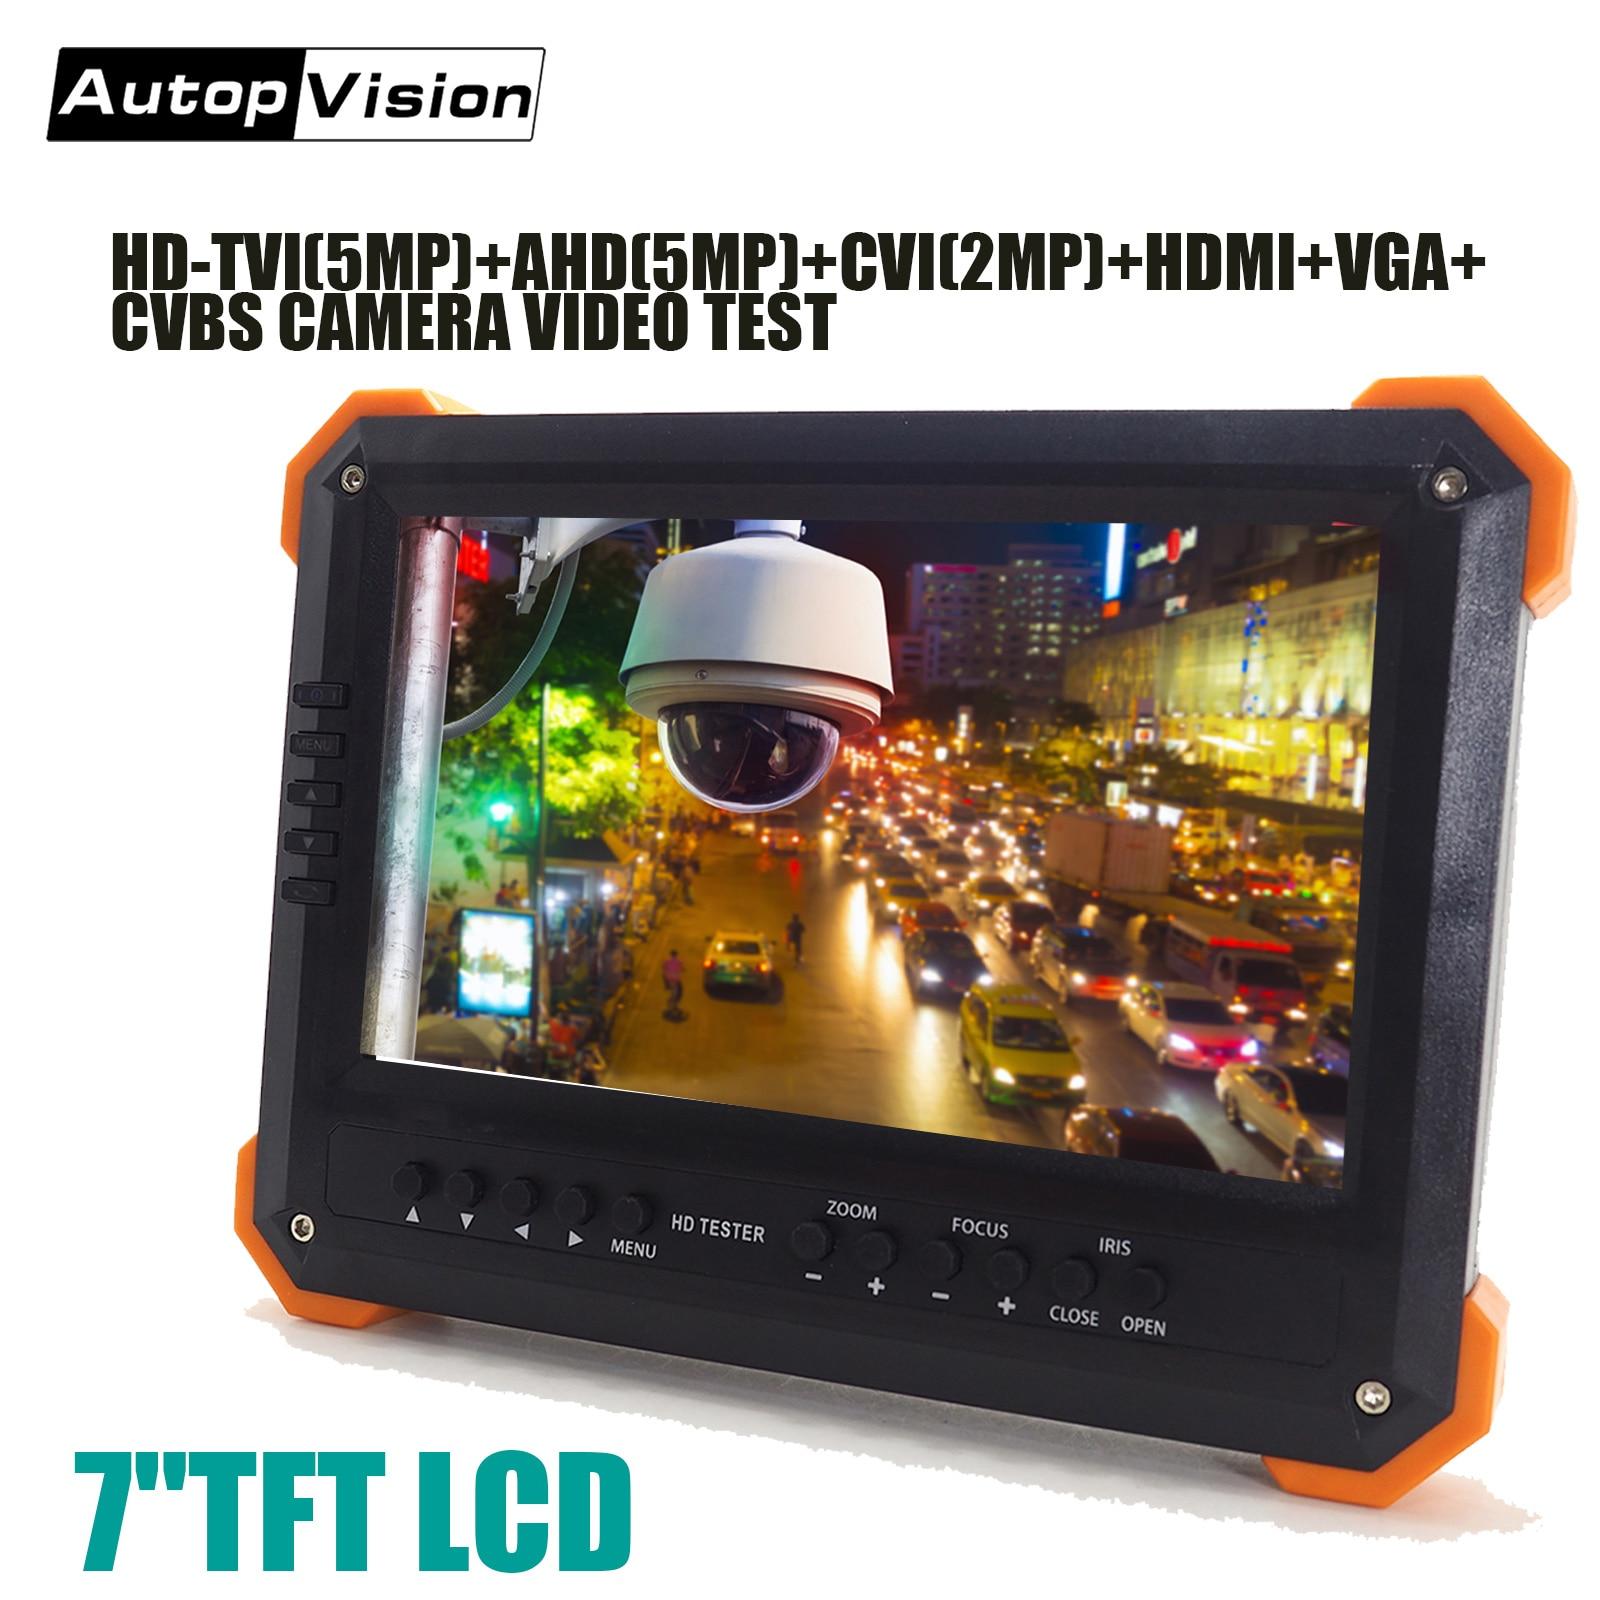 X41TAC NEW Update Portable CCTV Security Camera Monitor TVI AHD HDMI VGA CVBS Camera CCTV Tester 7